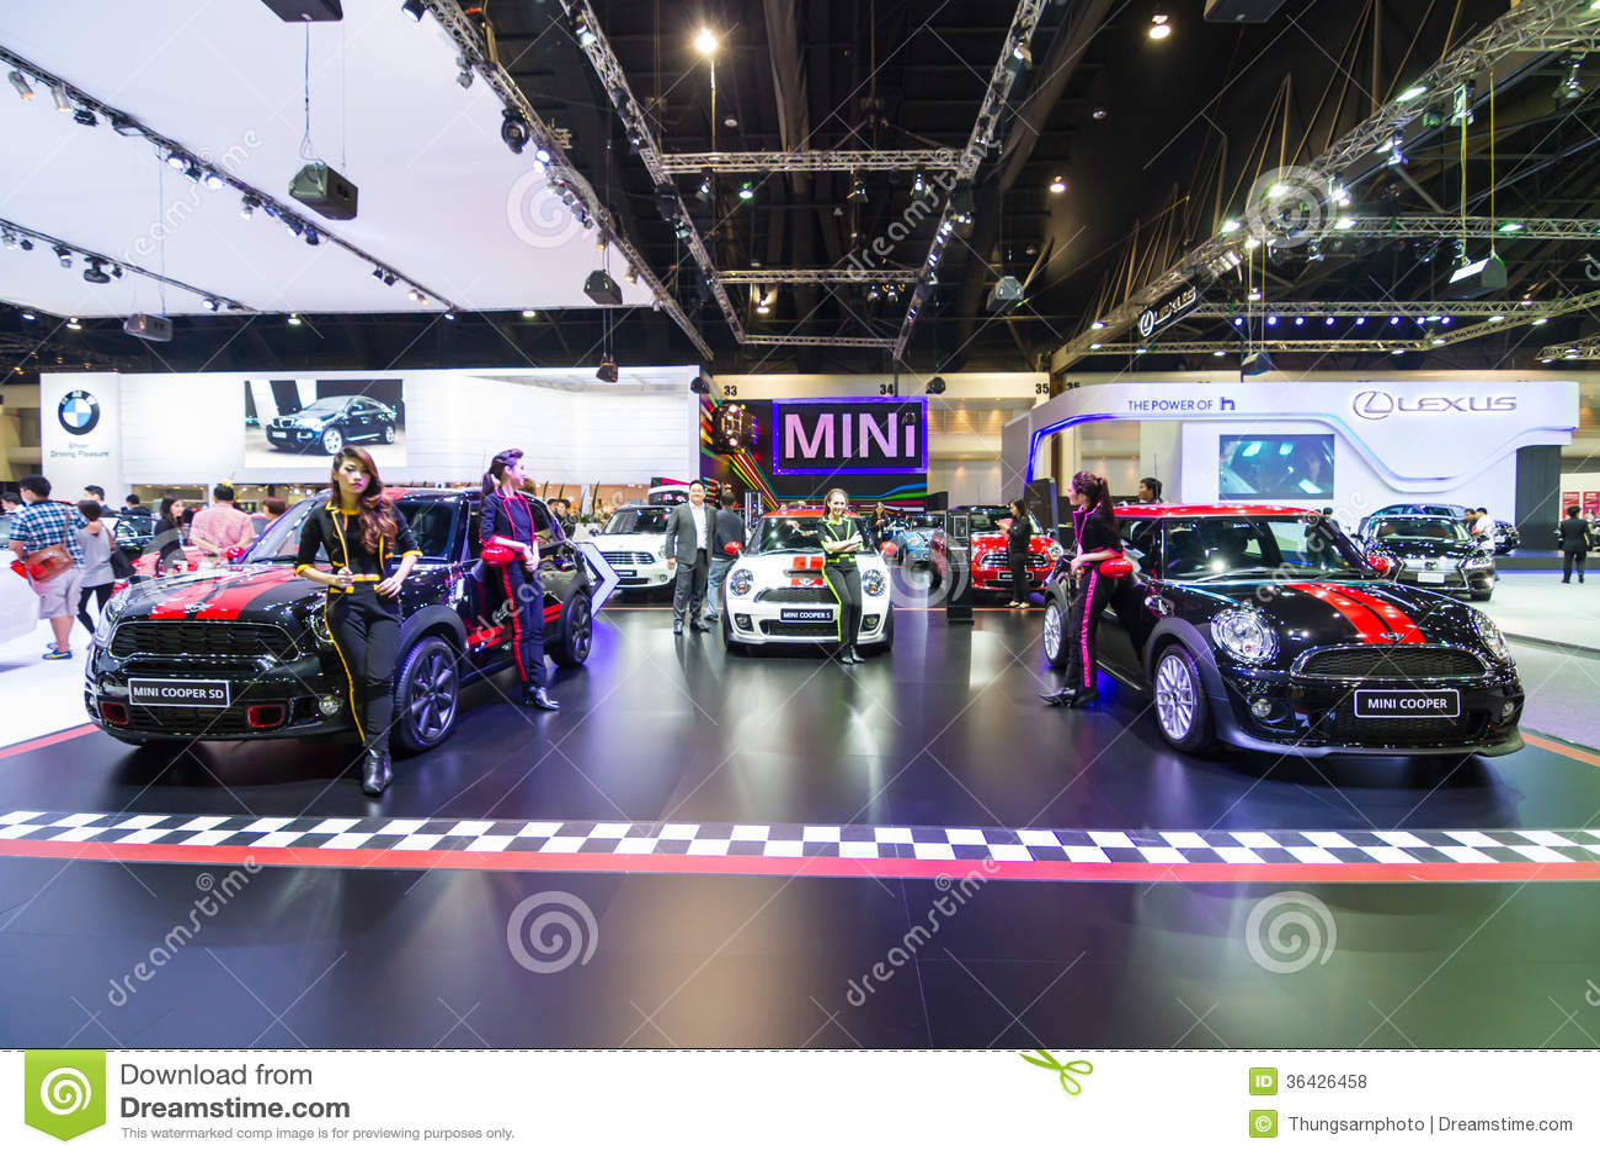 Mini cooper editorial image 57457962 for Motor city mini cooper